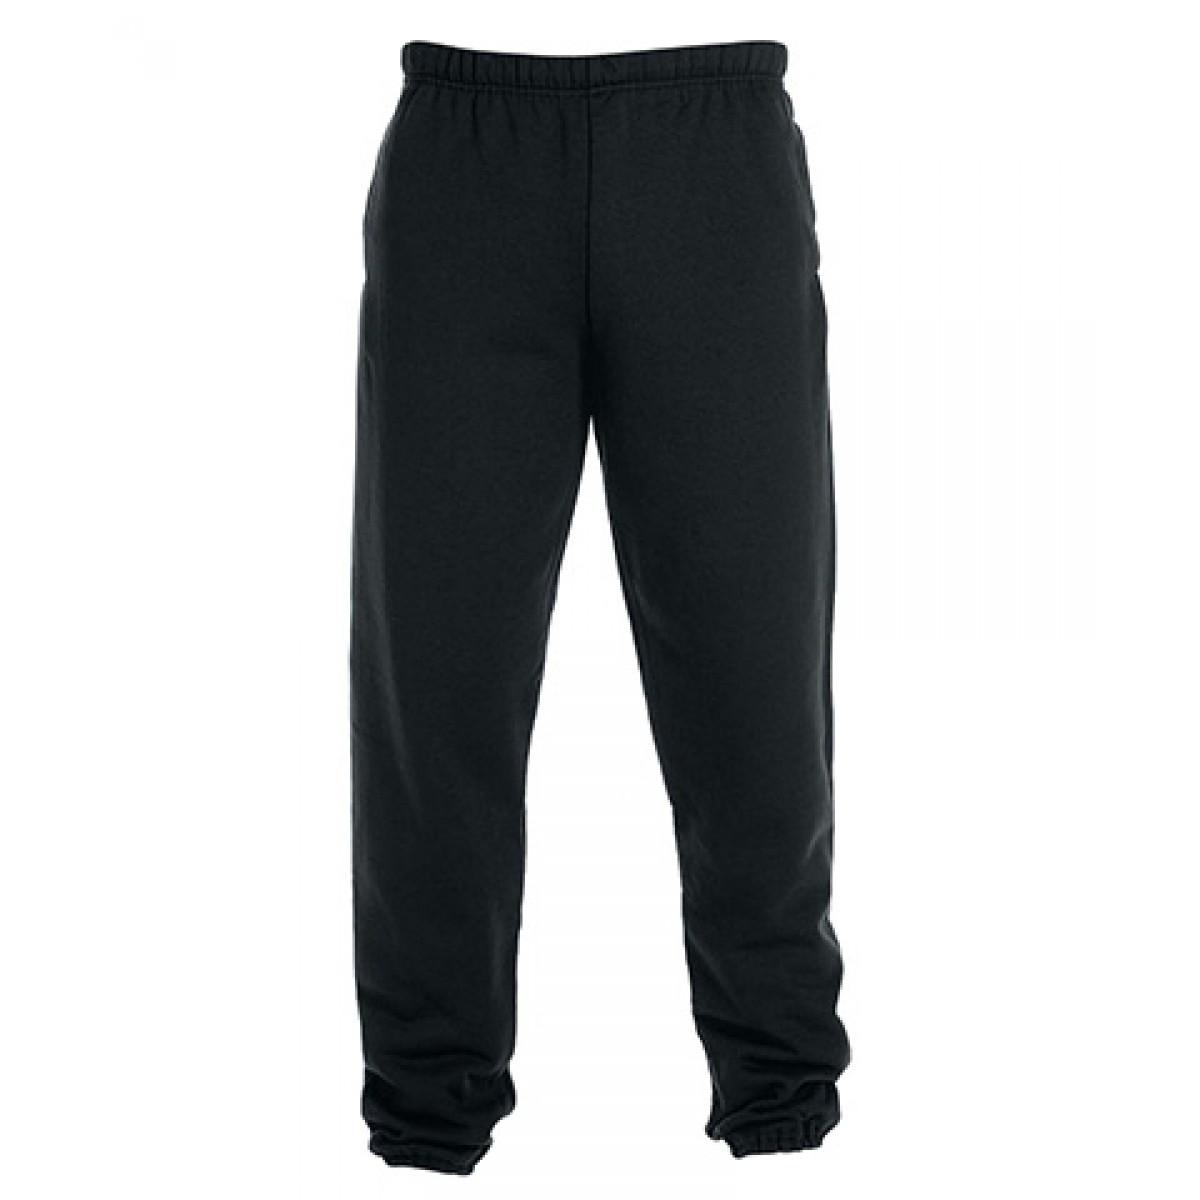 Fleece Pocketed Sweatpants-Black-XL